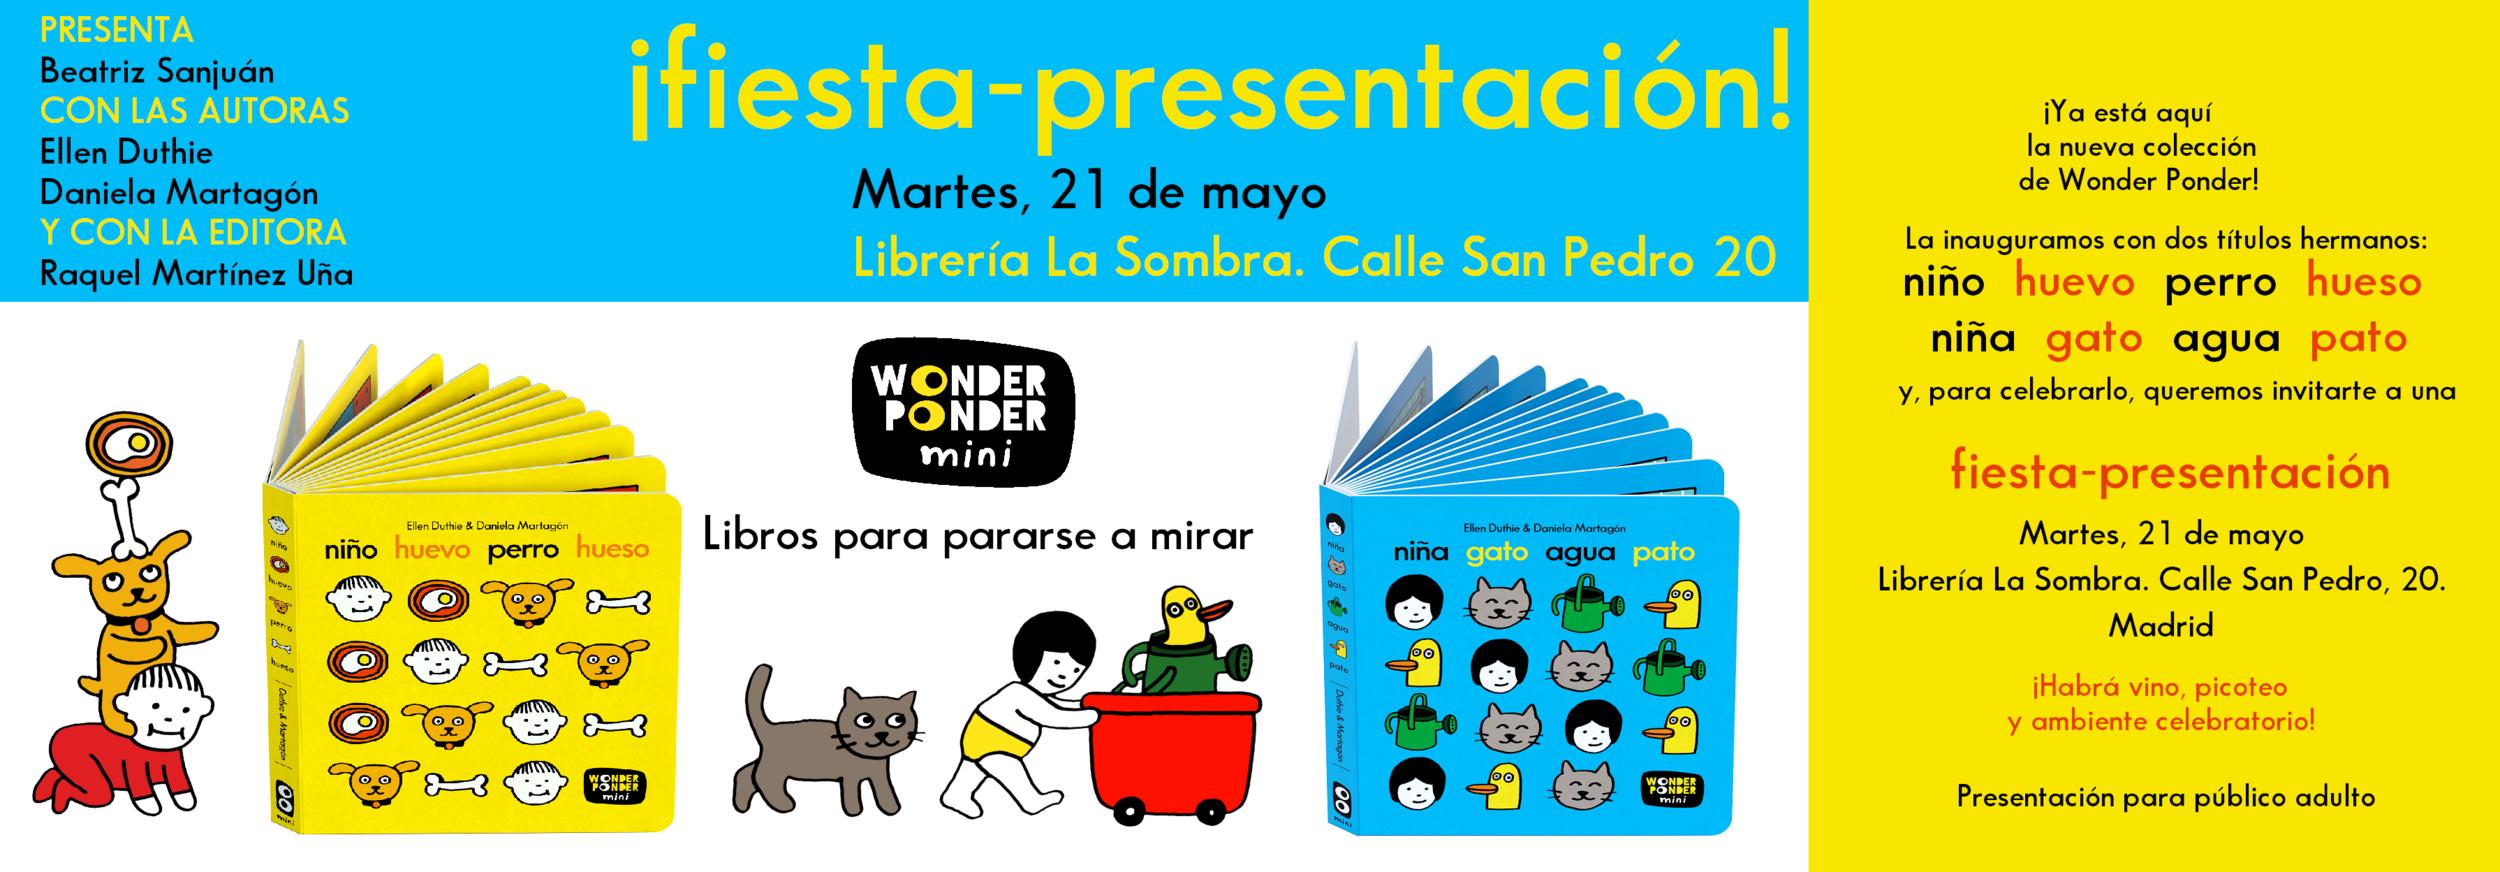 Invitacion Presentacion Wonder Ponder mini.png